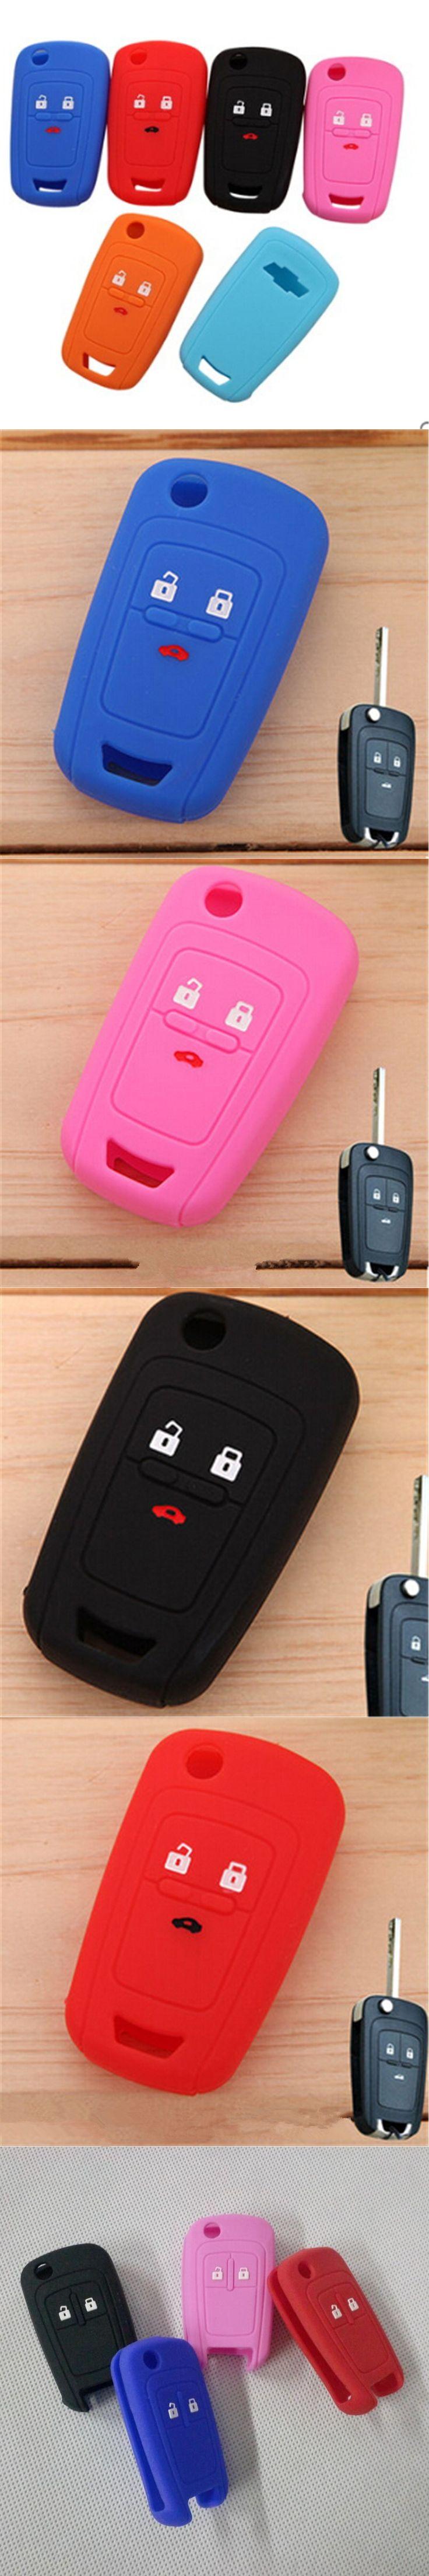 Silicone car key cover key protector keychain case for Chevrolet Cruze TRAX Lova Spark Onix Silverado Volt Camaro Aveo Sail